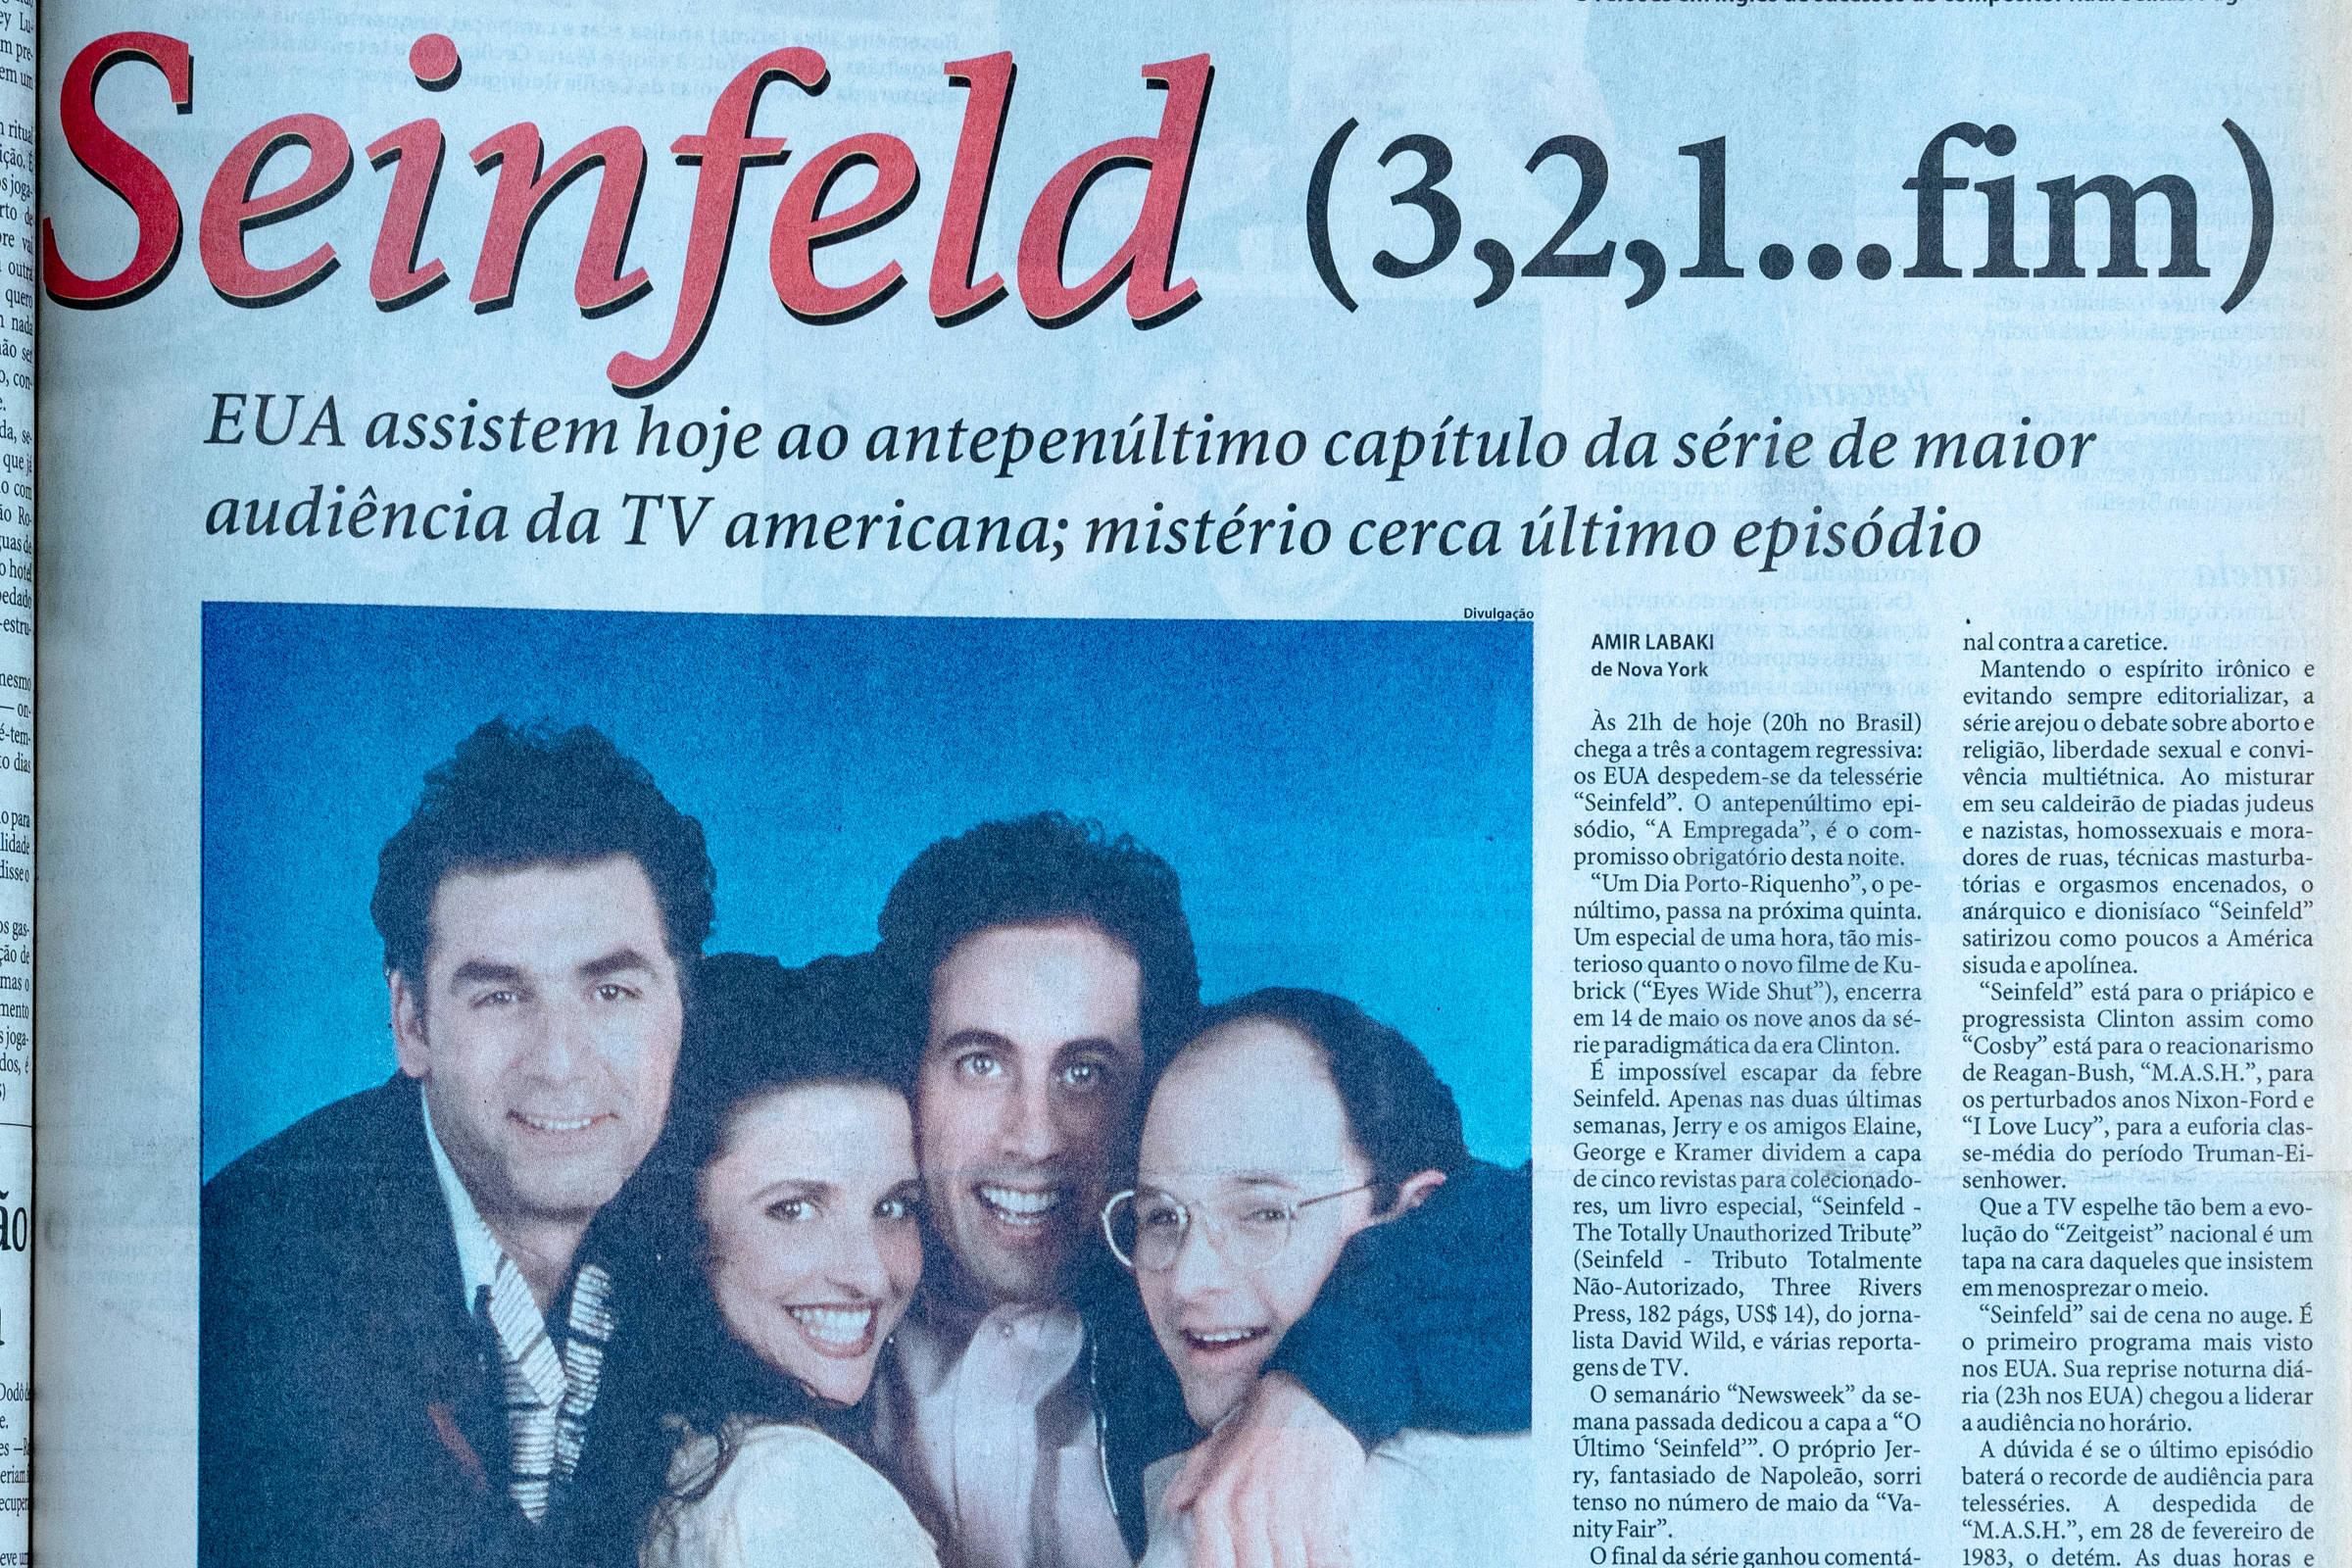 Capa da Ilustrada de abril de 1998